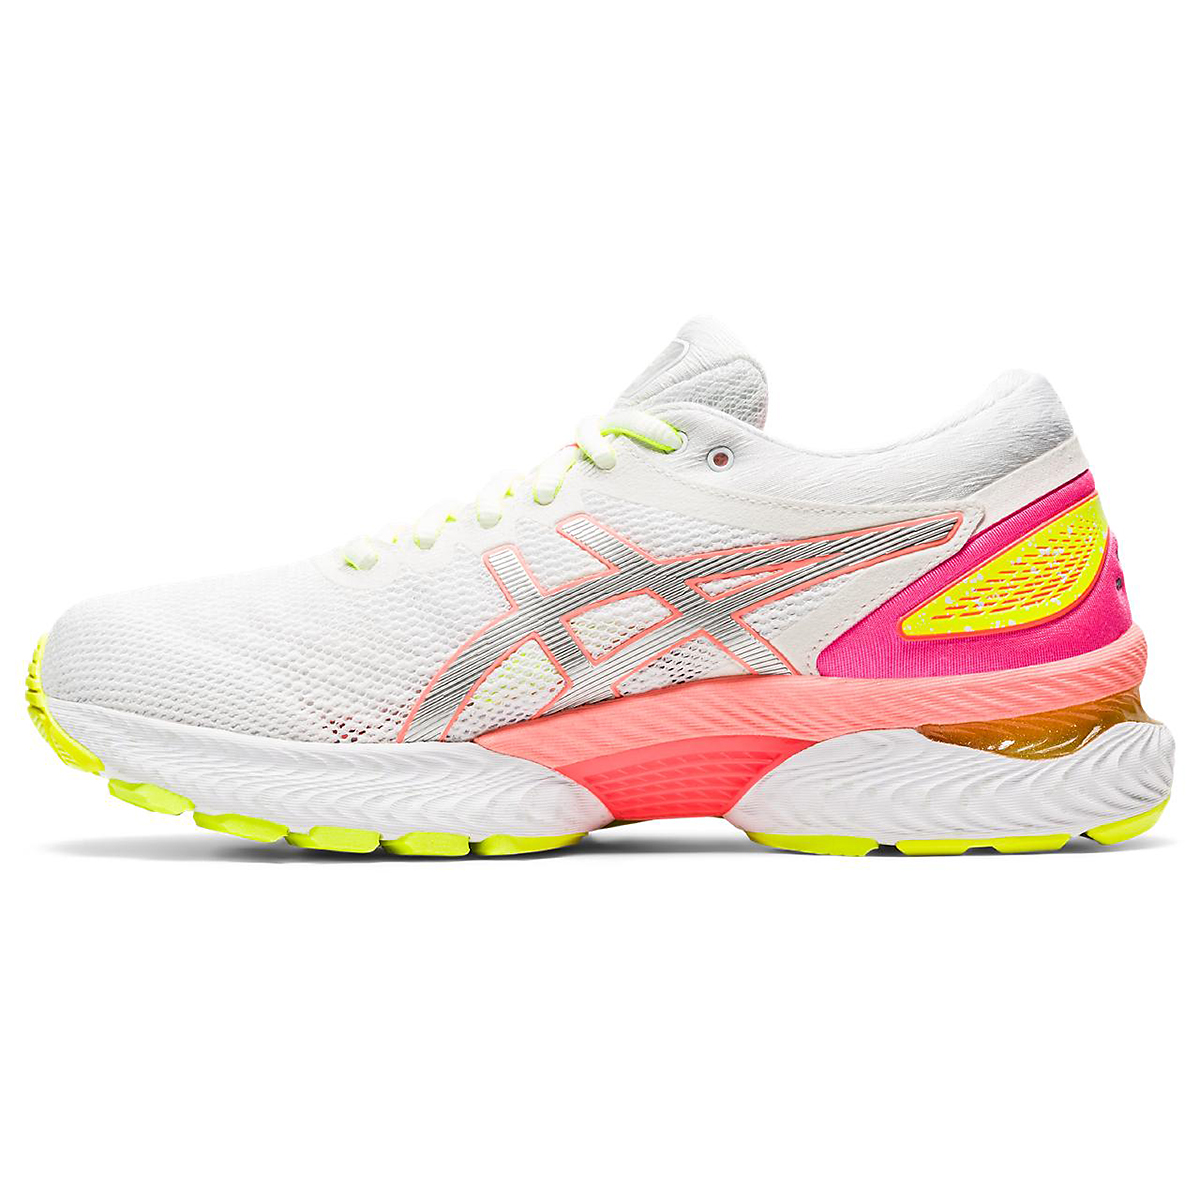 Women's Asics Gel-Nimbus 22 Lite Show Running Shoe - Color: White/Sun Coral - Size: 5 - Width: Regular, White/Sun Coral, large, image 3